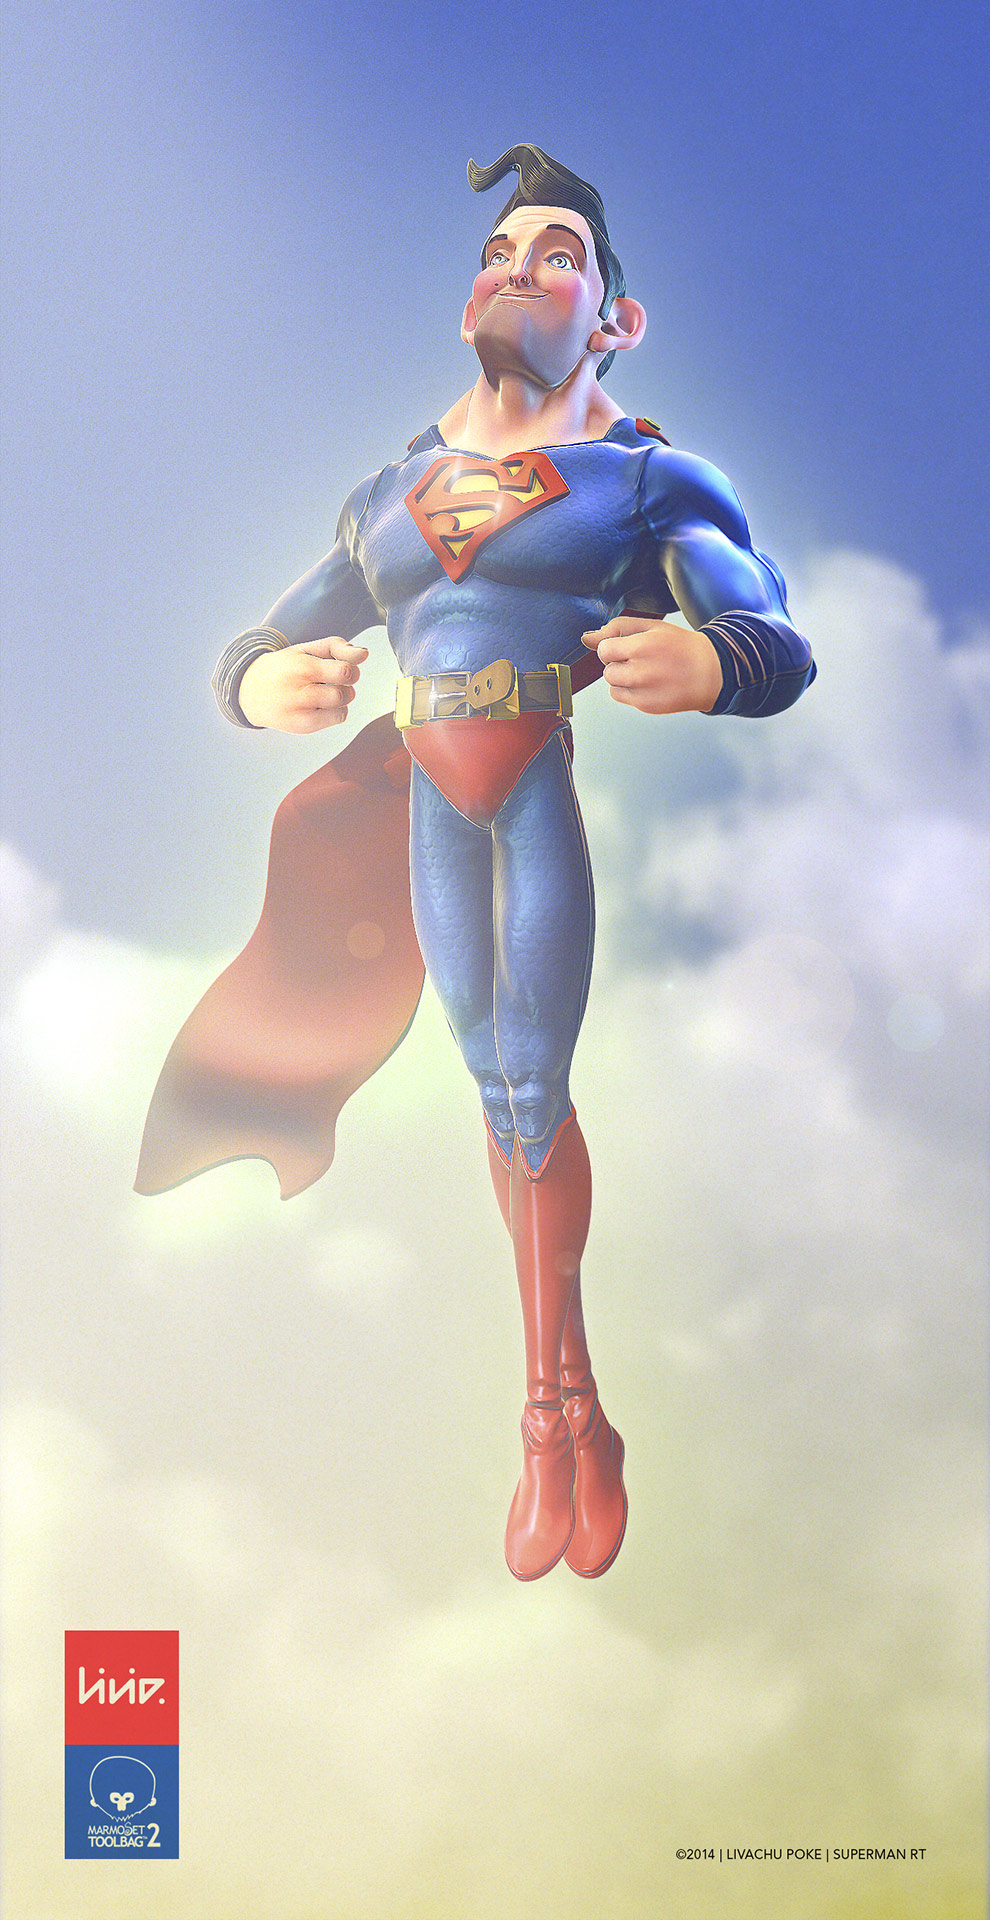 Livachu superman rt 1 3ec73071 vbcc